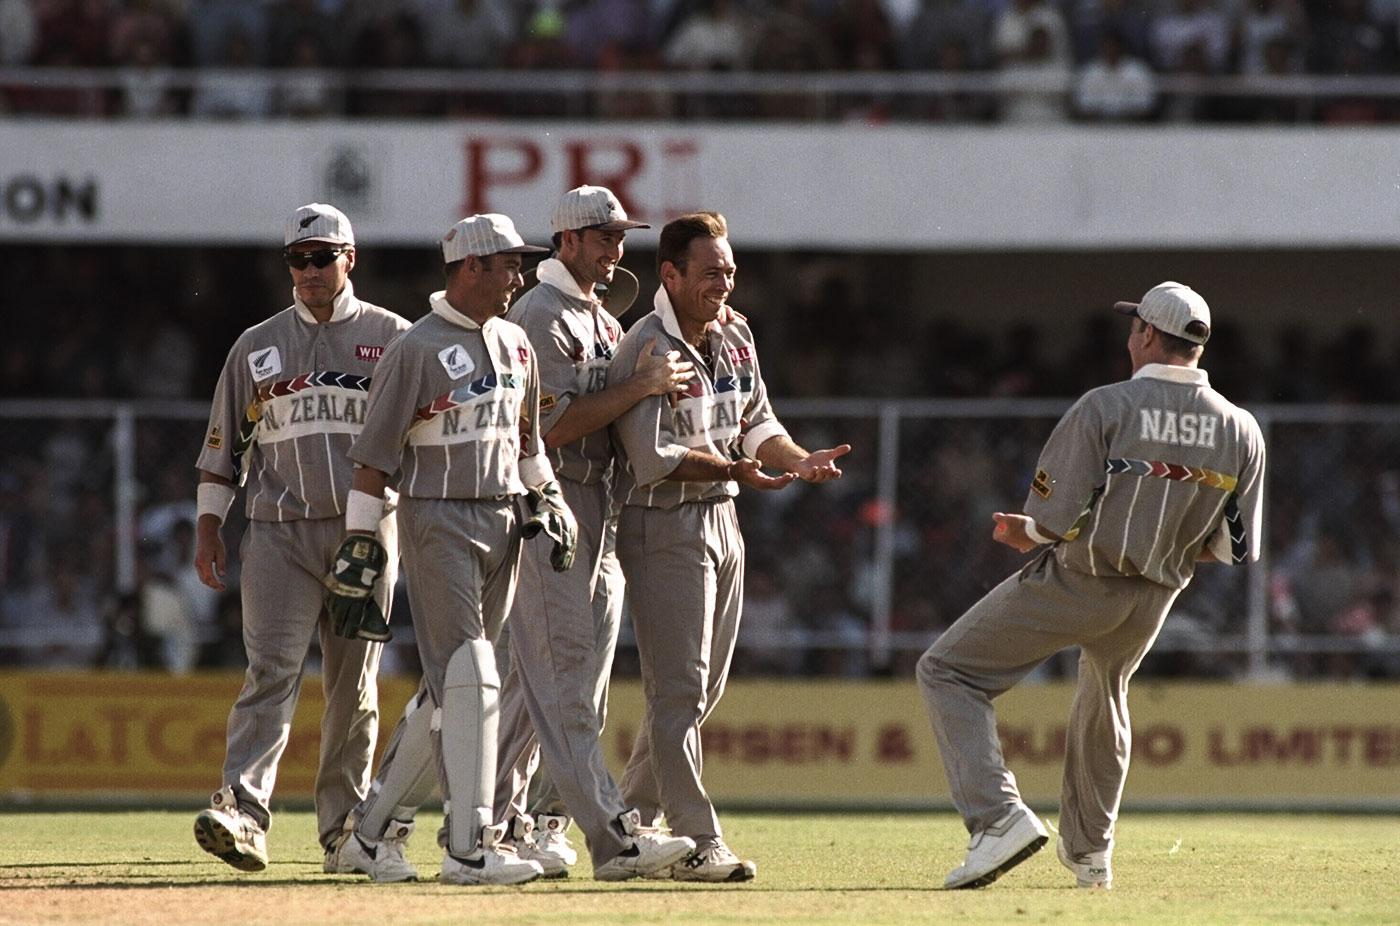 Dion Nash celebrates a wicket